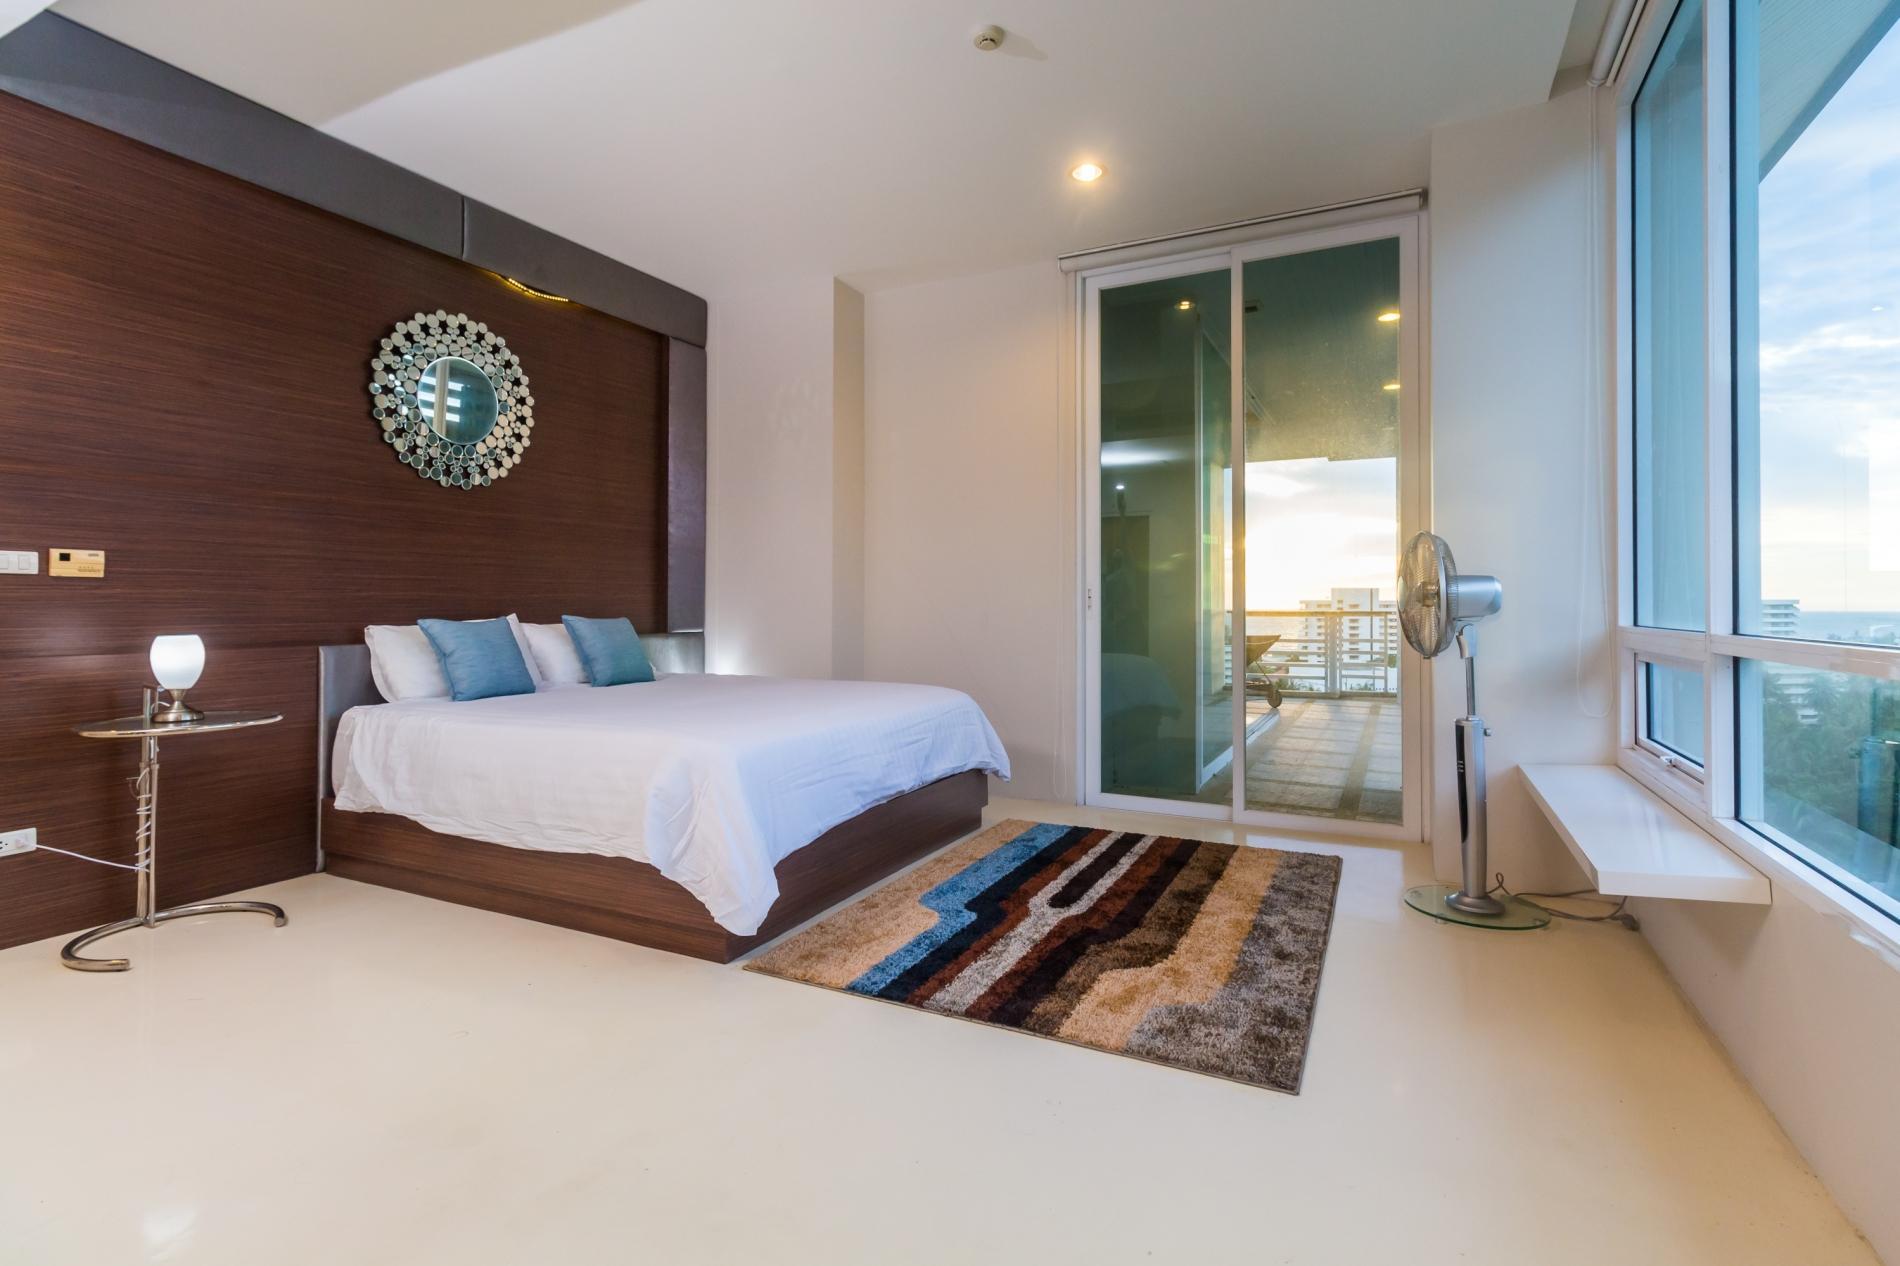 KH2605 - Sea-view Penthouse in Karon, walk to beach, restaurants, bars, shops photo 18884524